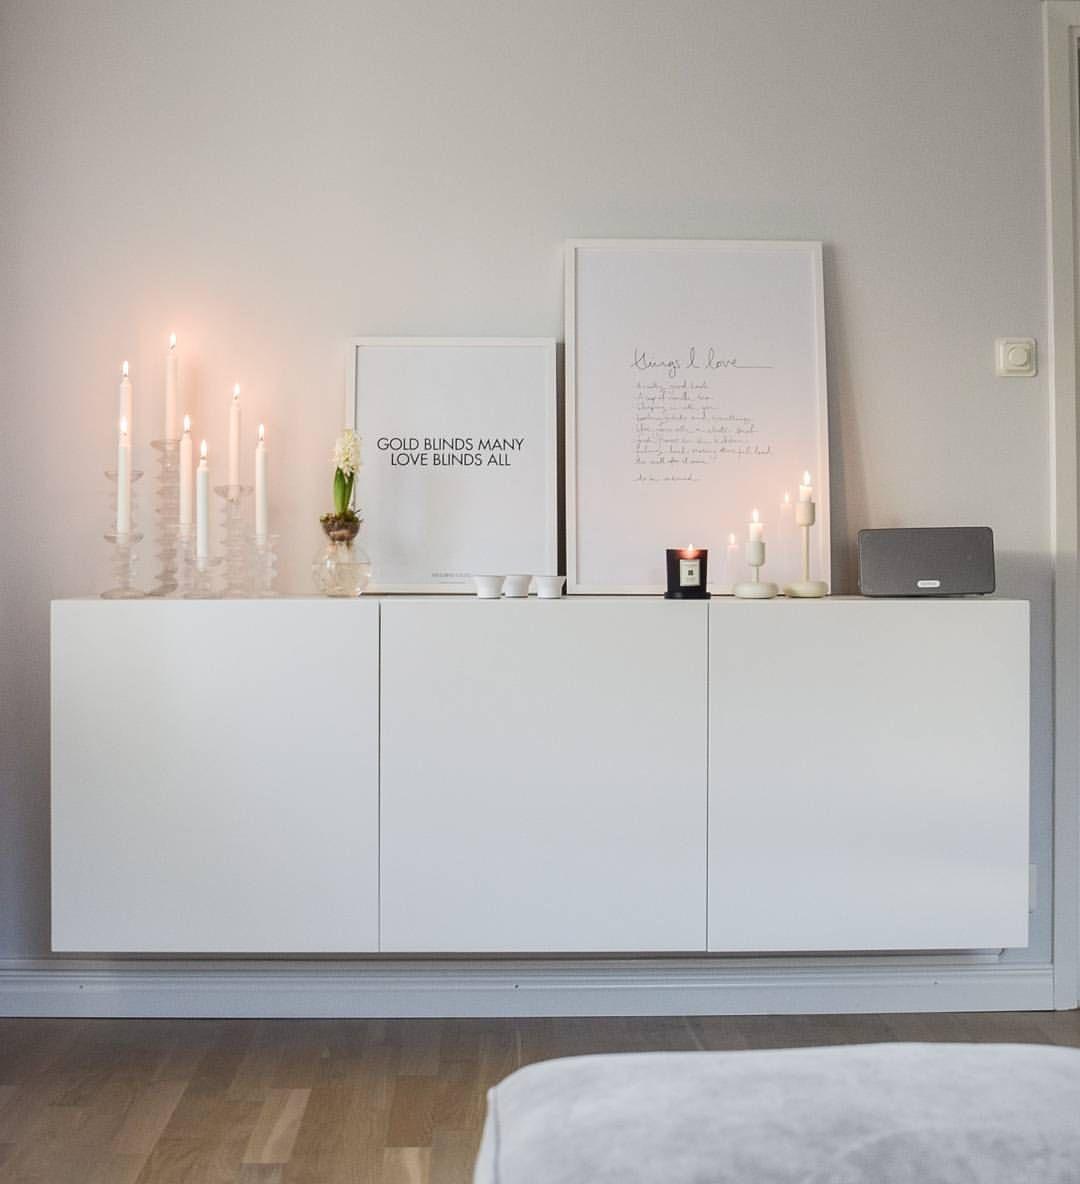 Wohnzimmer  Wohnung wohnzimmer, Wohnzimmer ideen wohnung, Ikea